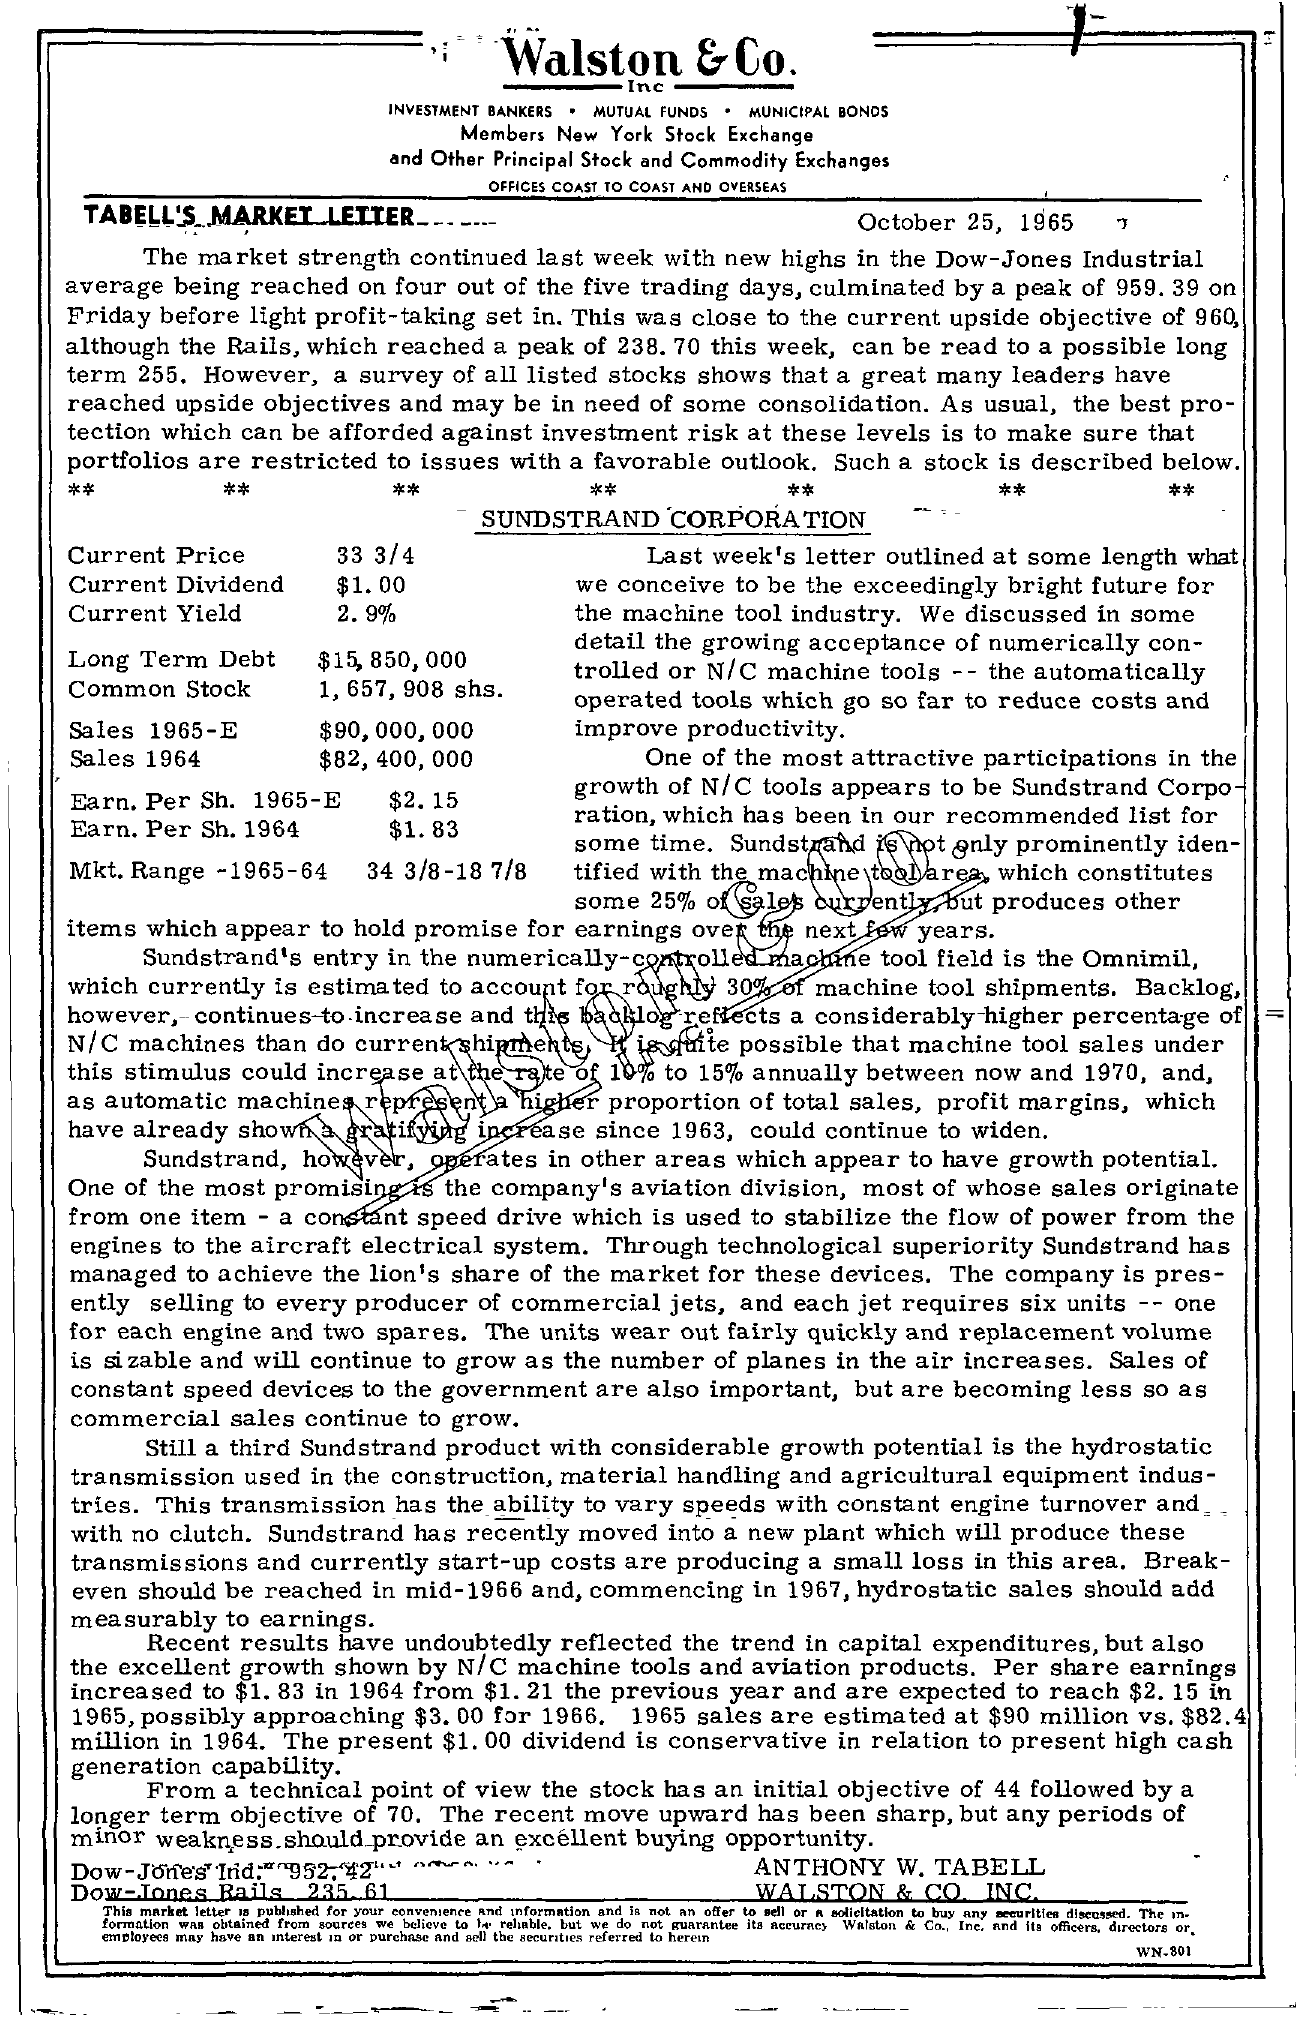 Tabell's Market Letter - October 25, 1965